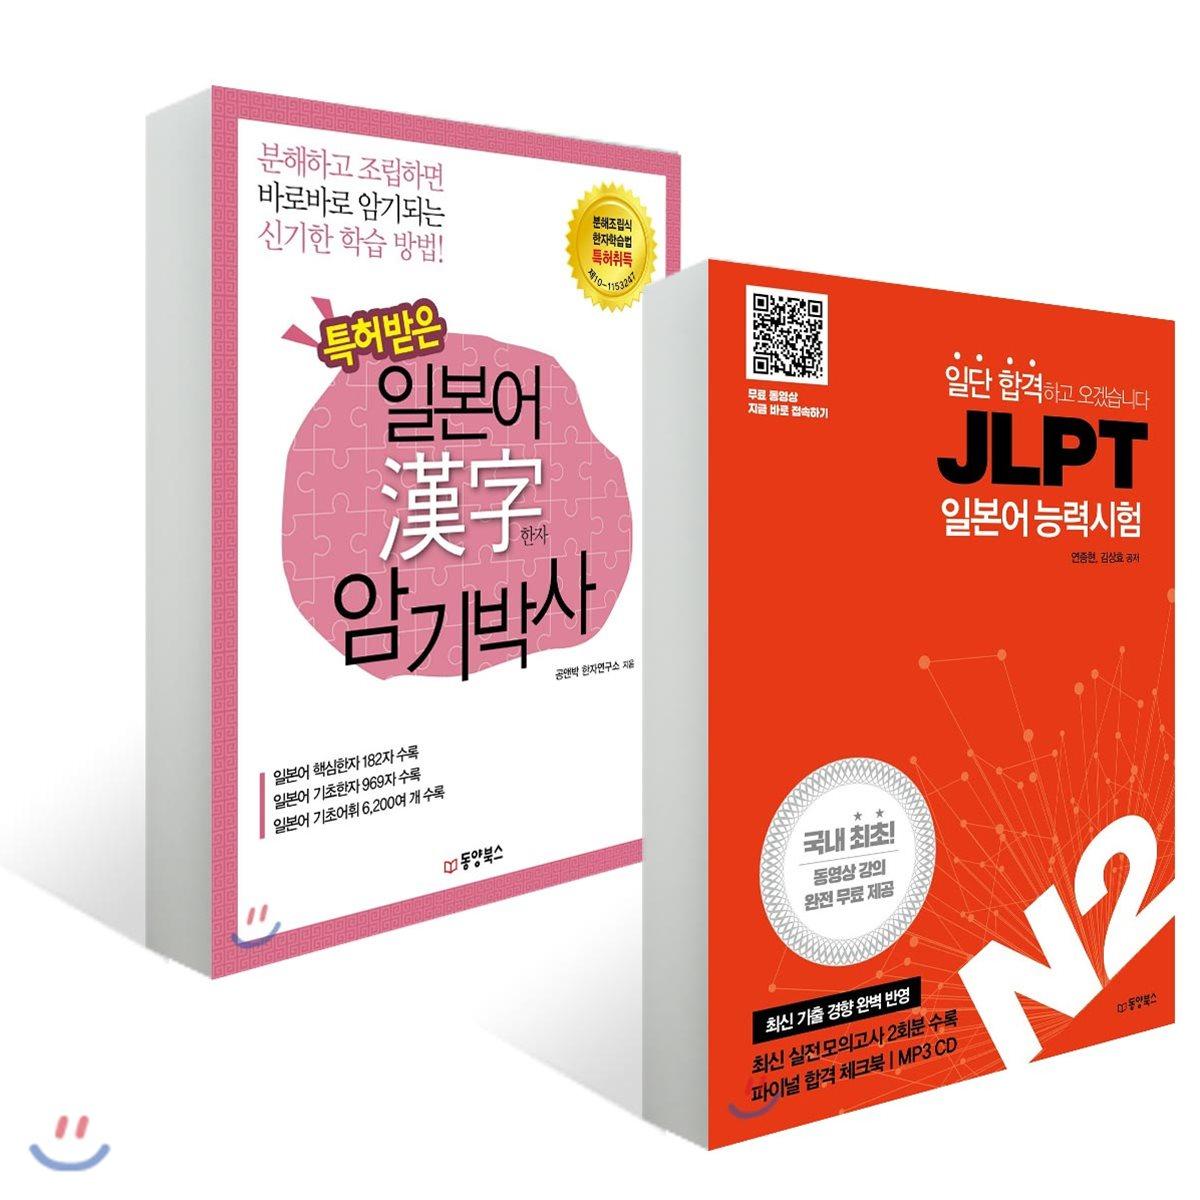 JLPT 2급 완전정복 세트